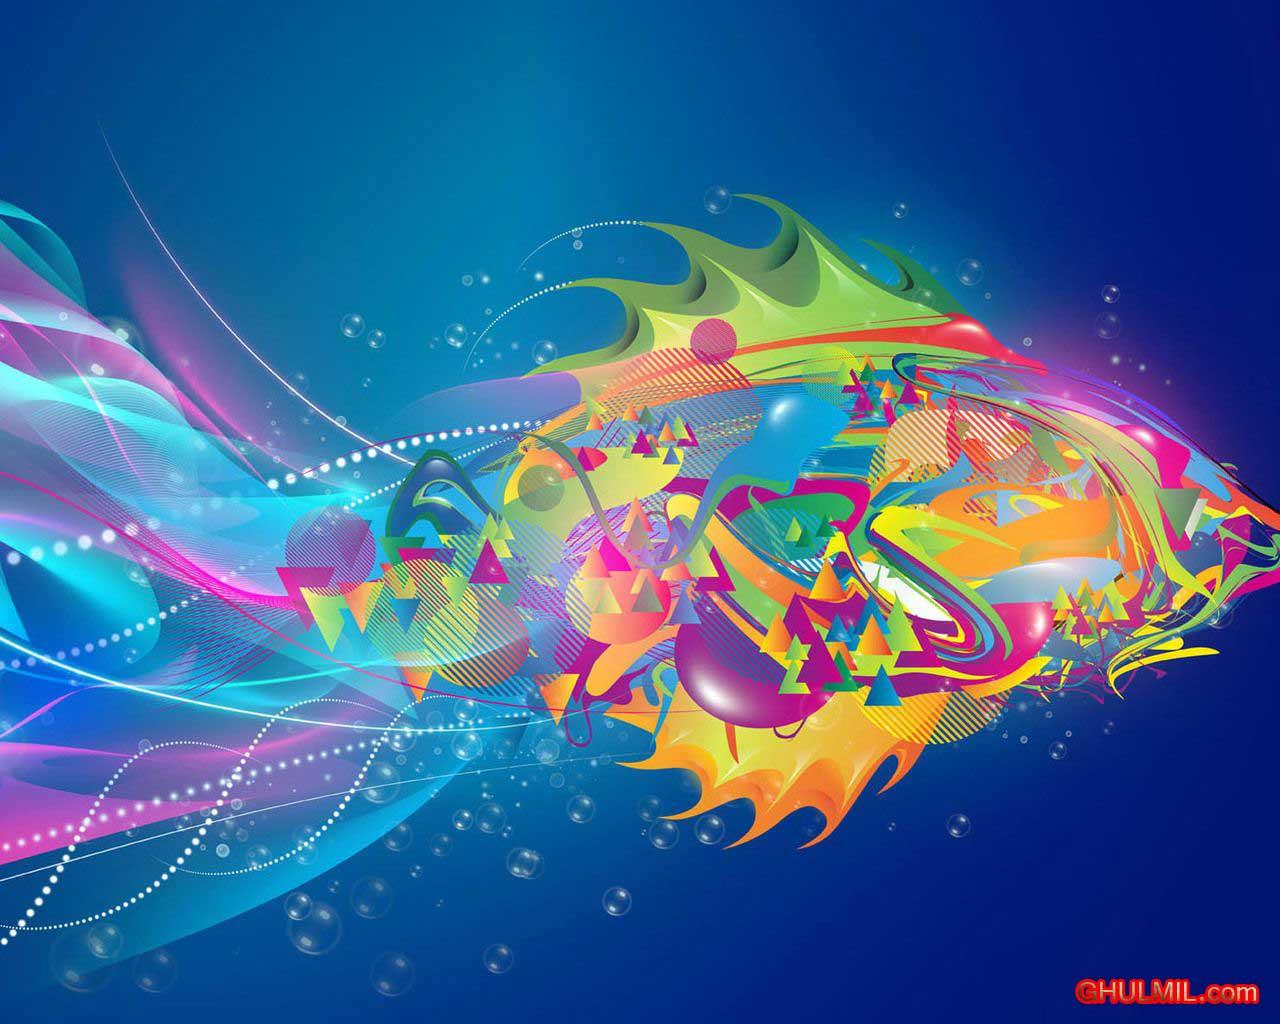 Wallpaper Download 210 HD Wallpaper 3D Desktop Backgrounds 1280x1024